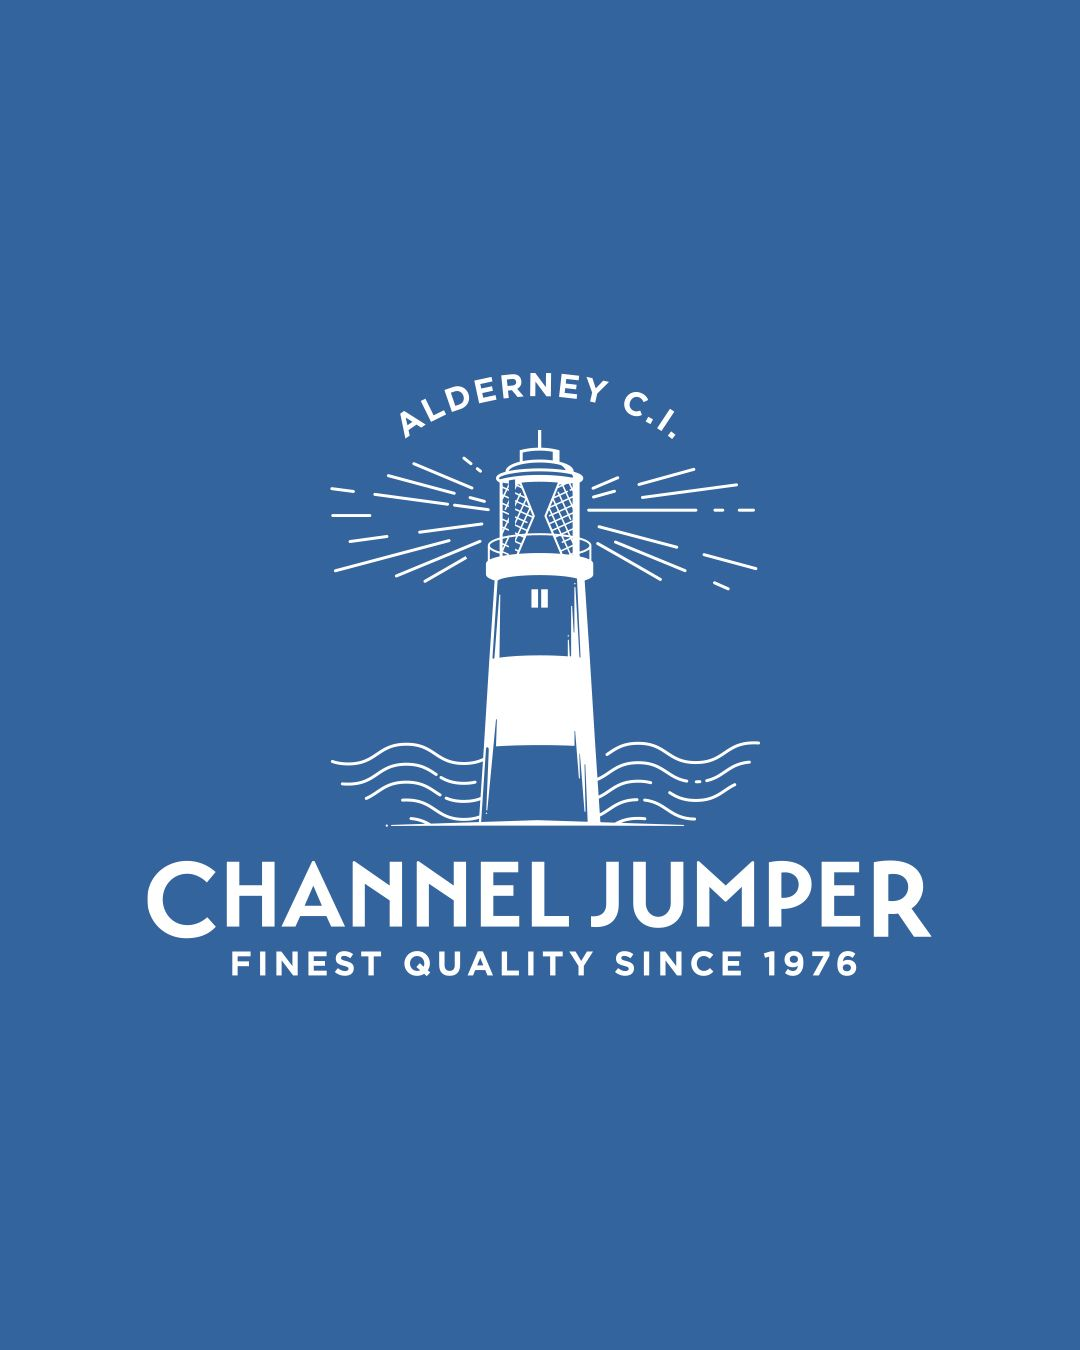 Channel Jumper